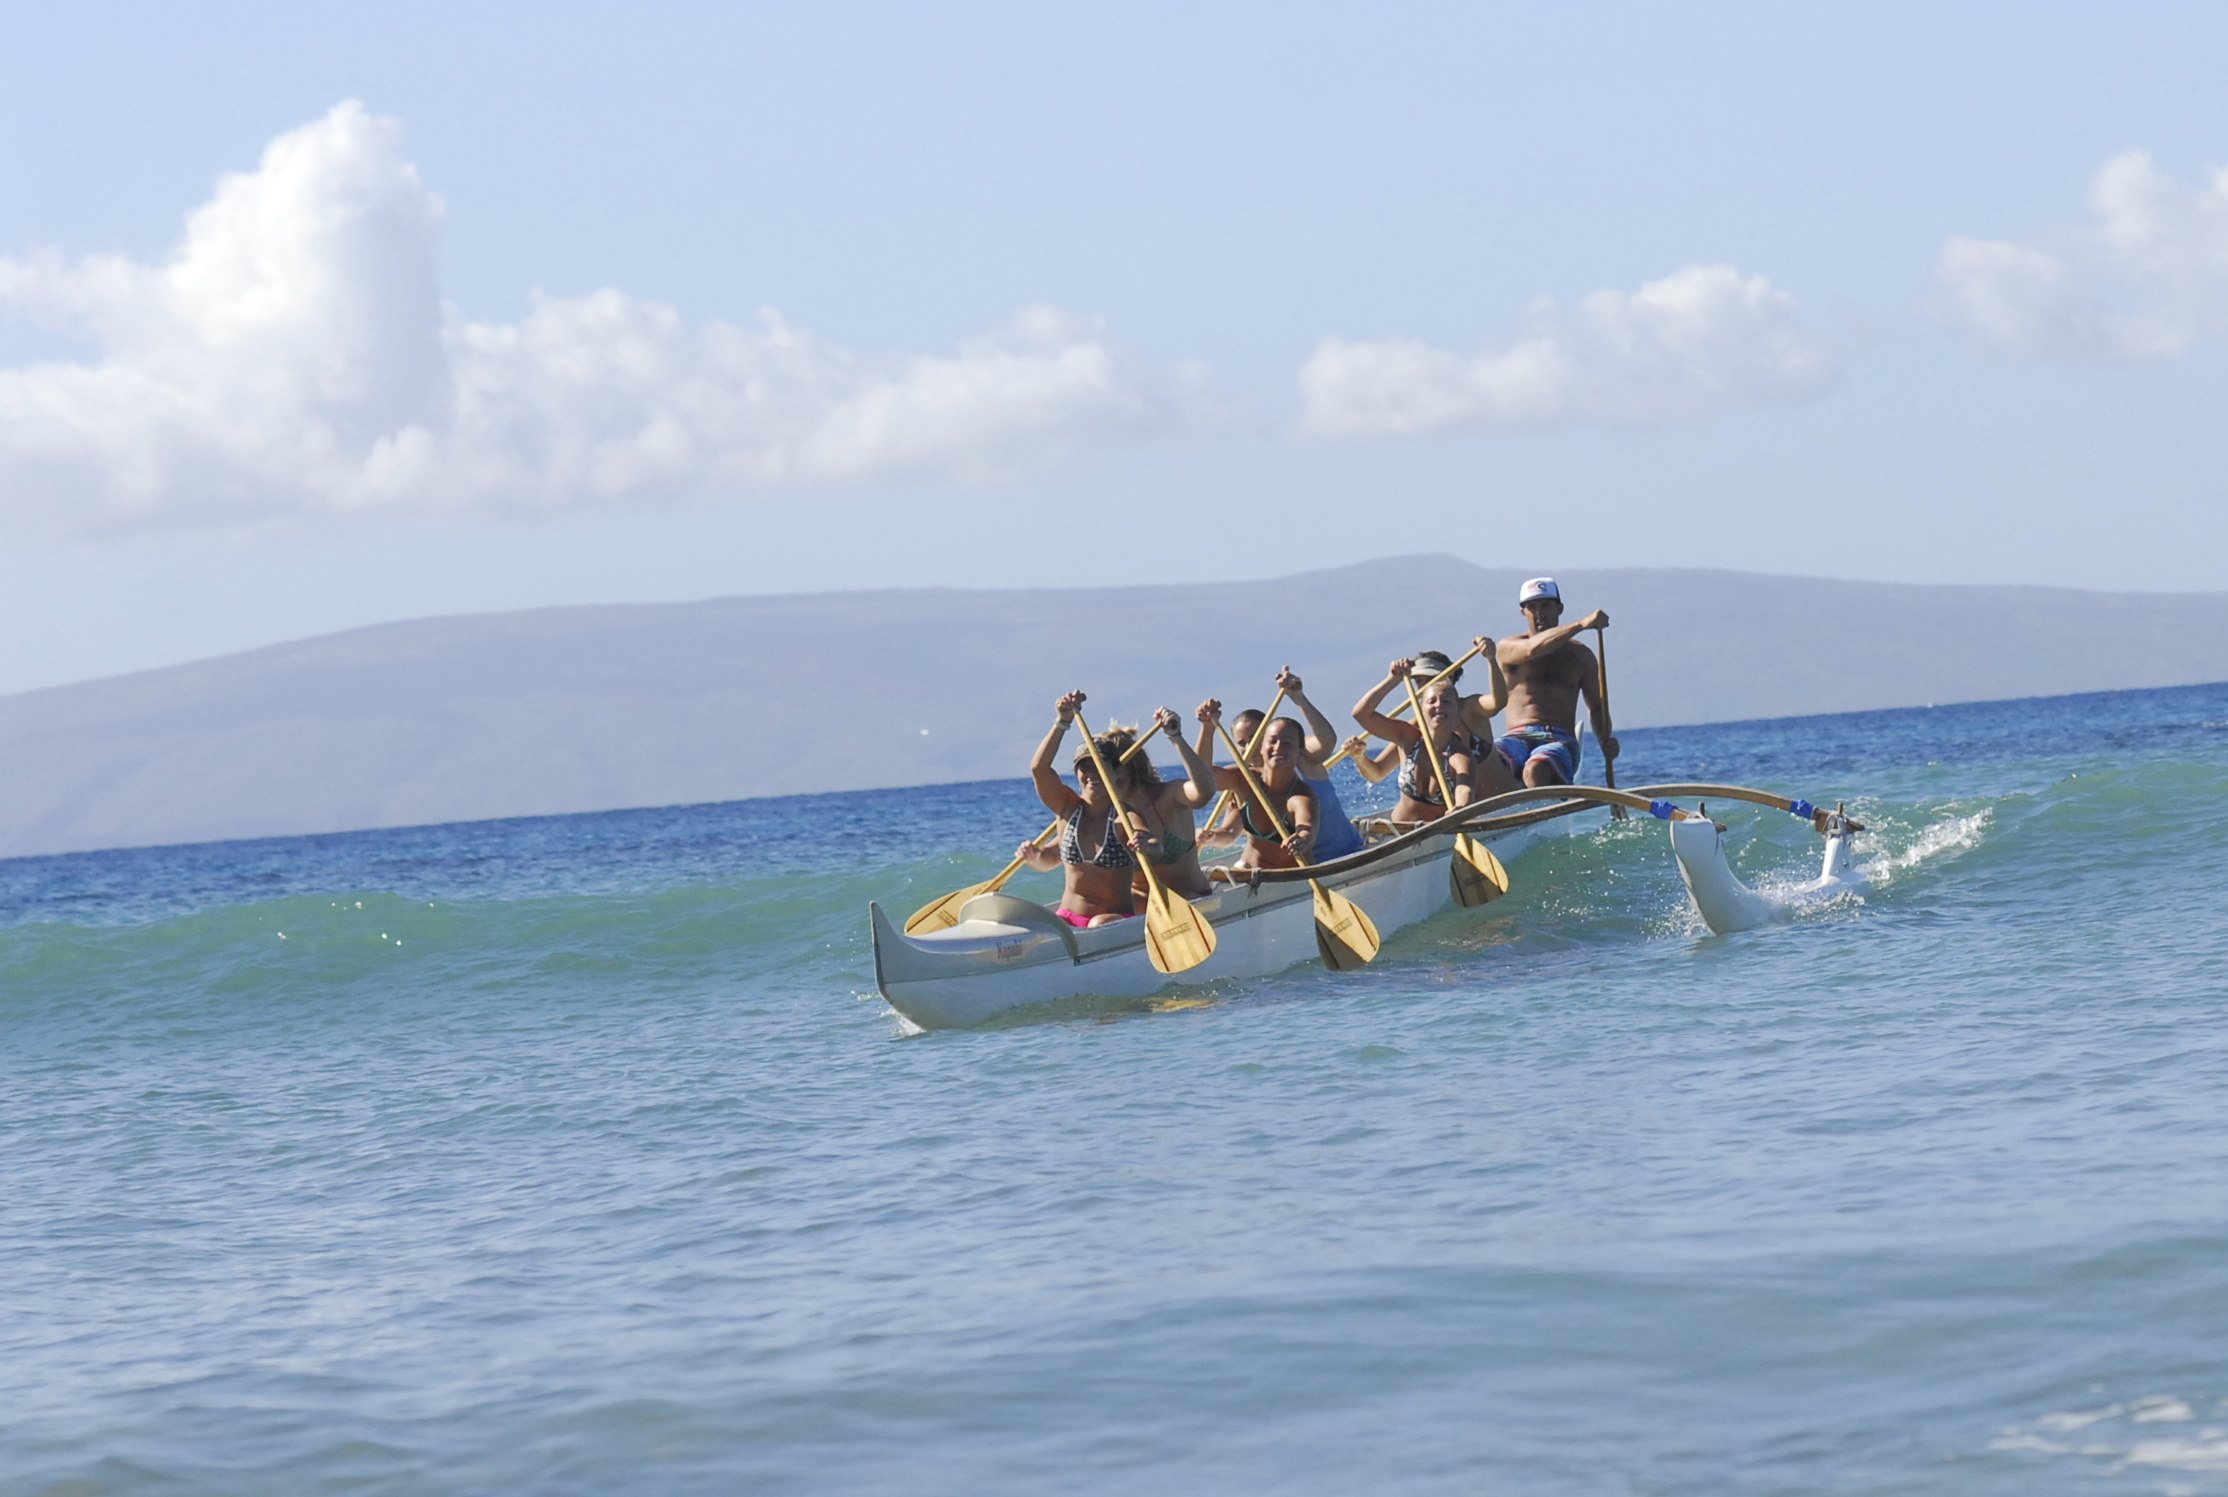 Blue Soul Maui, Maui, Private Tours, Maui Private Tours, Outrigger Canoe, Outrigger Canoe Tour, Paddle Adventure, Canoe Surfing, Outdoor Adventure